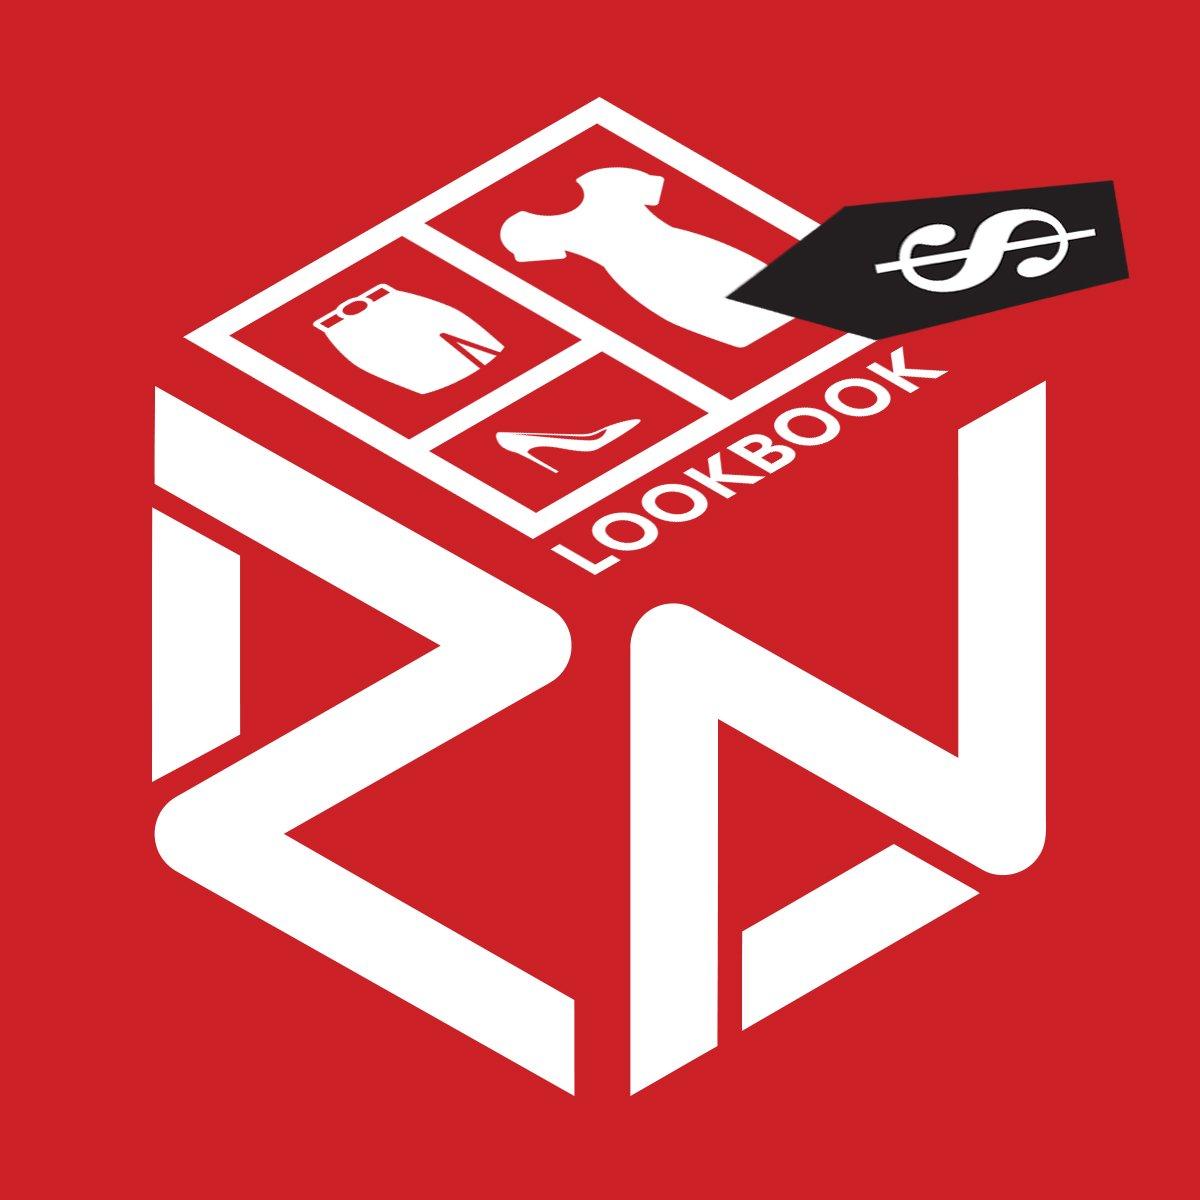 Shopify Lookbook app by Zination